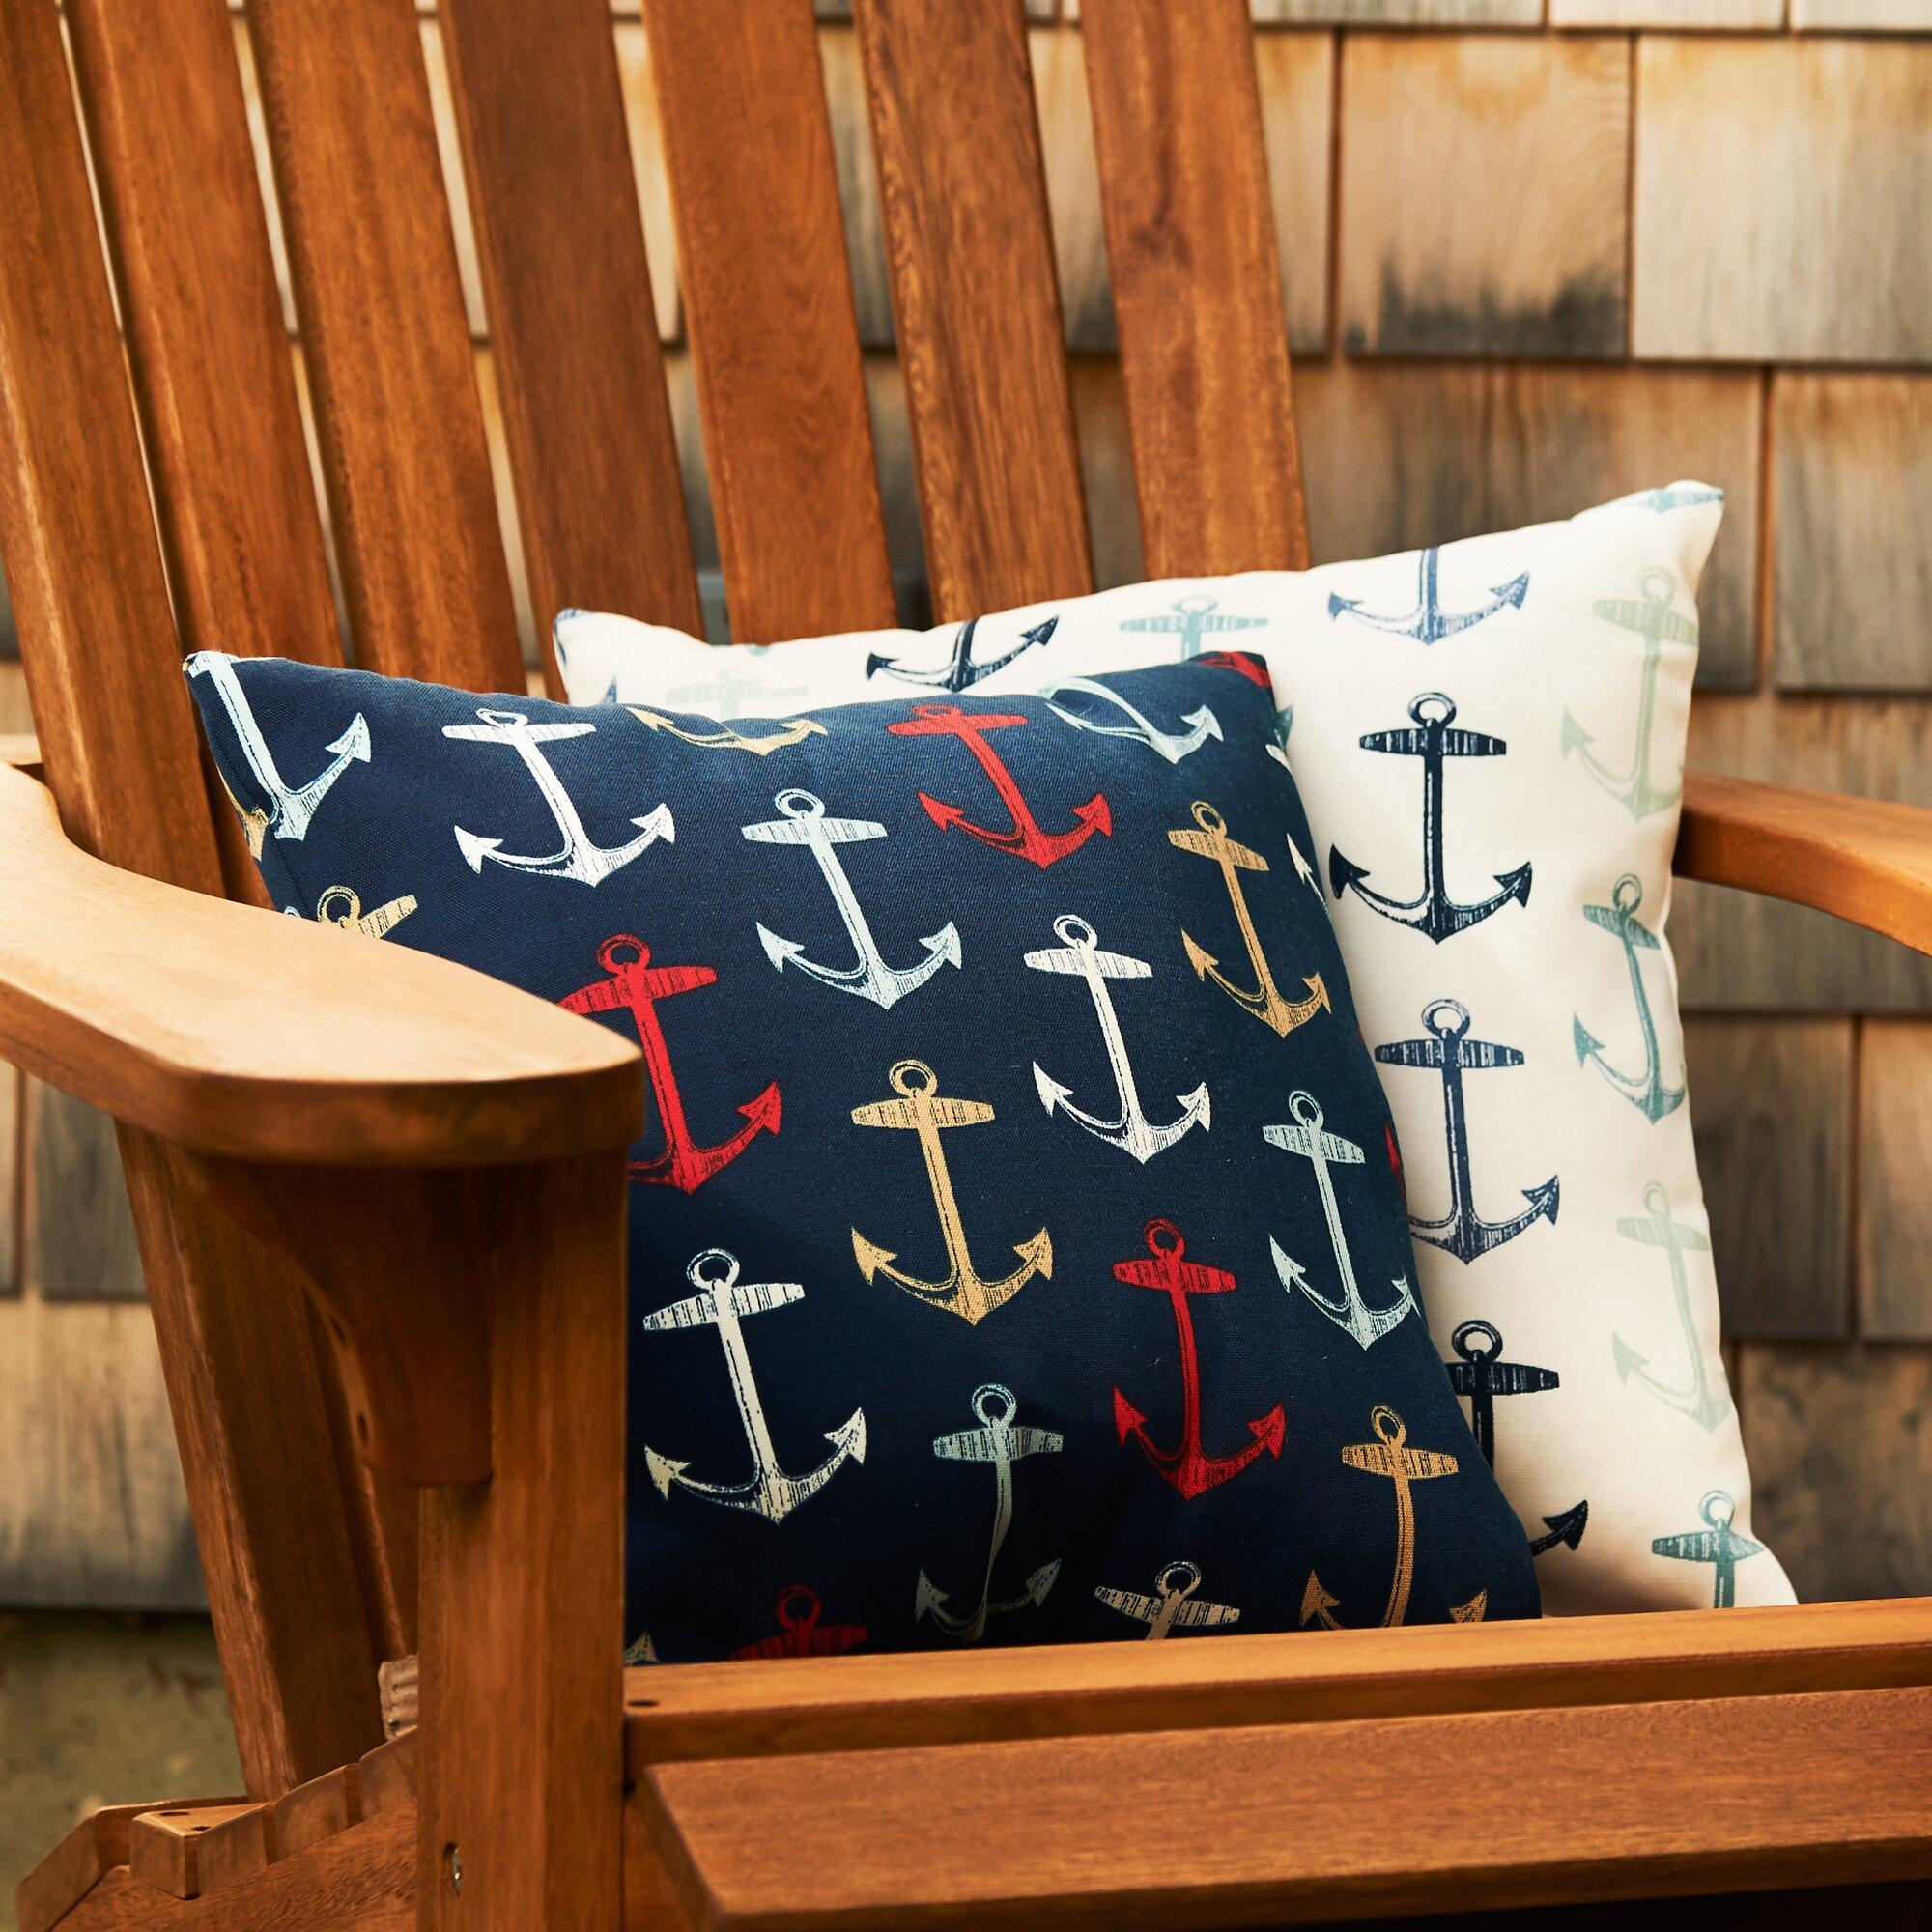 Anchors Away Throw Pillow & Reviews Birch Lane